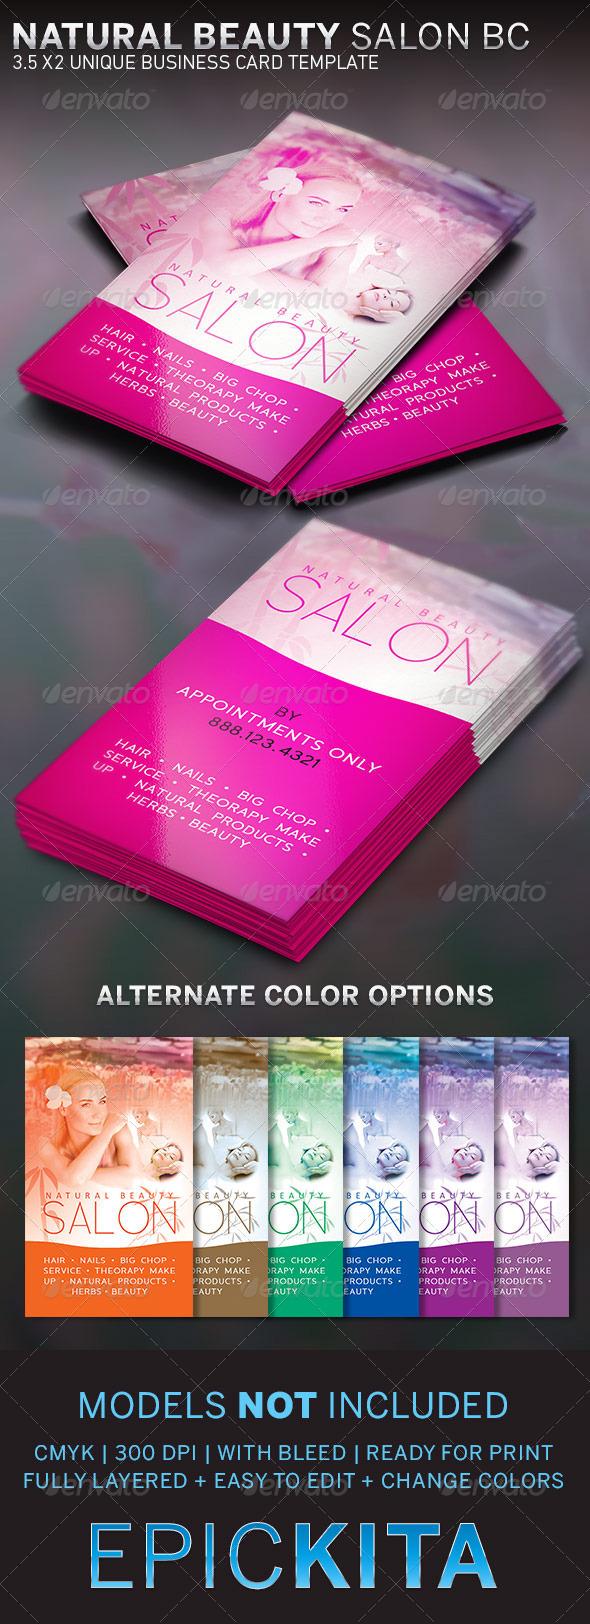 Beauty Salon and Spa Business Card on Behance